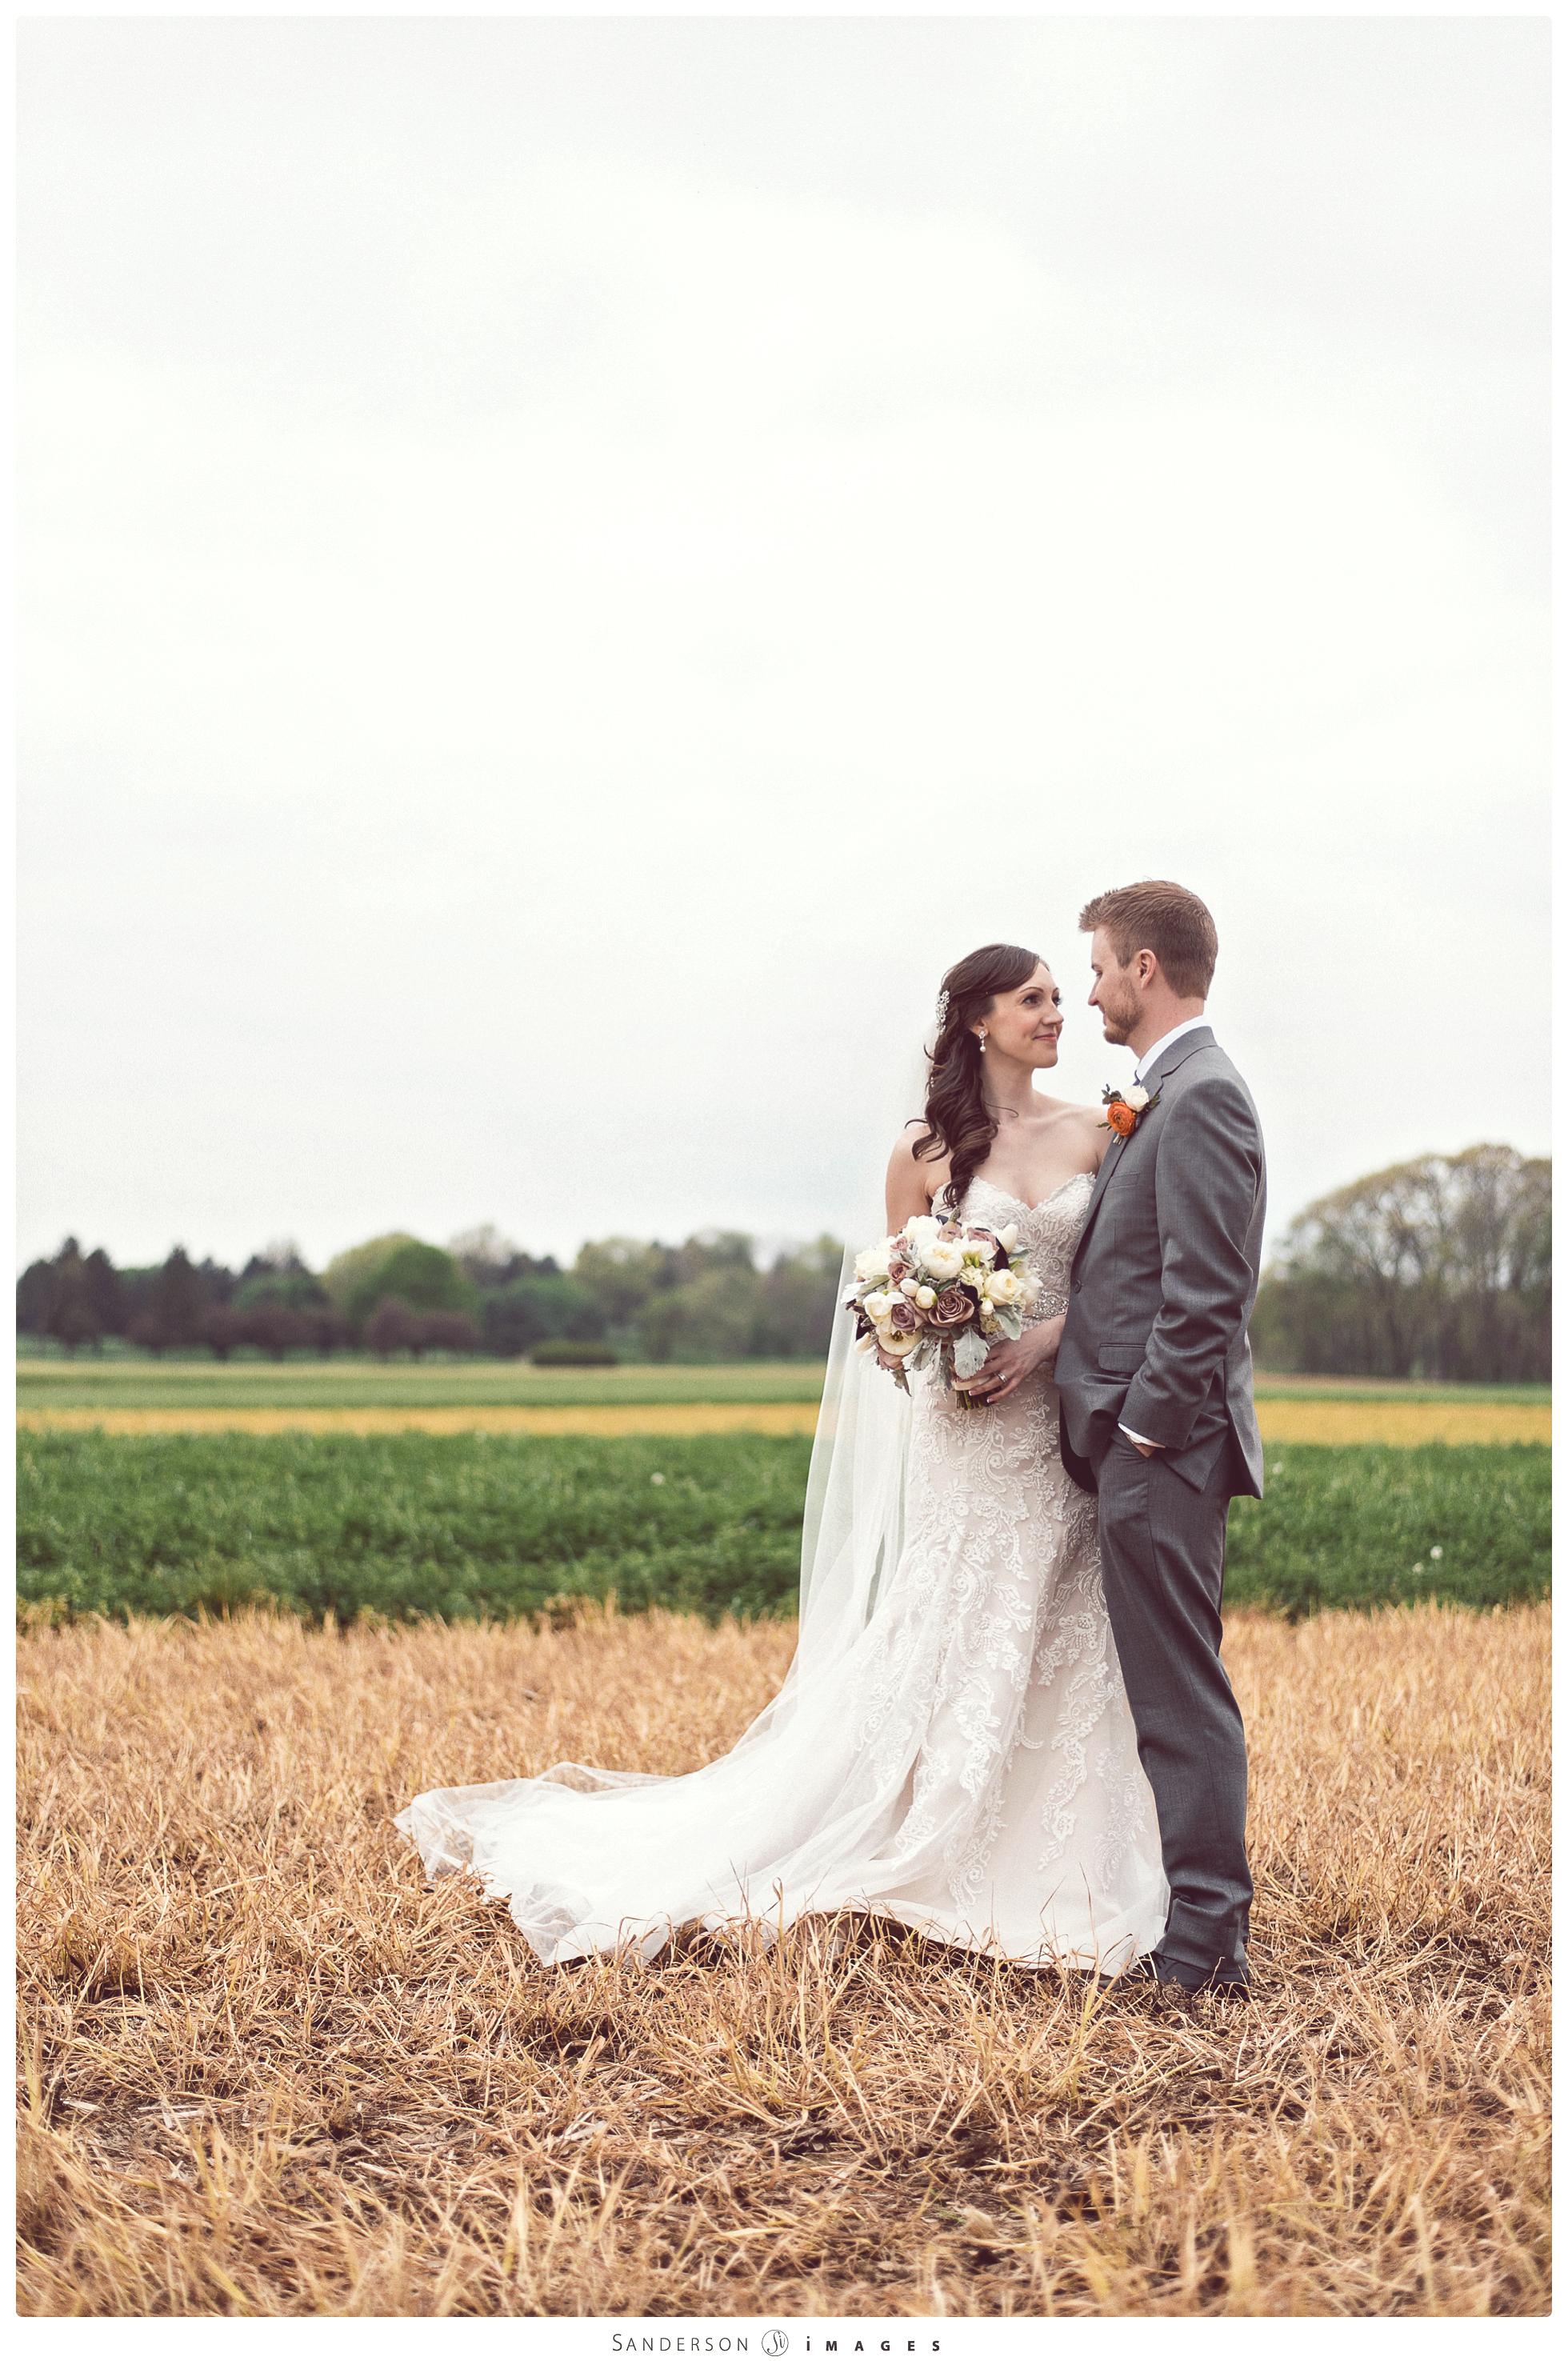 Tessa sanderson wedding photos